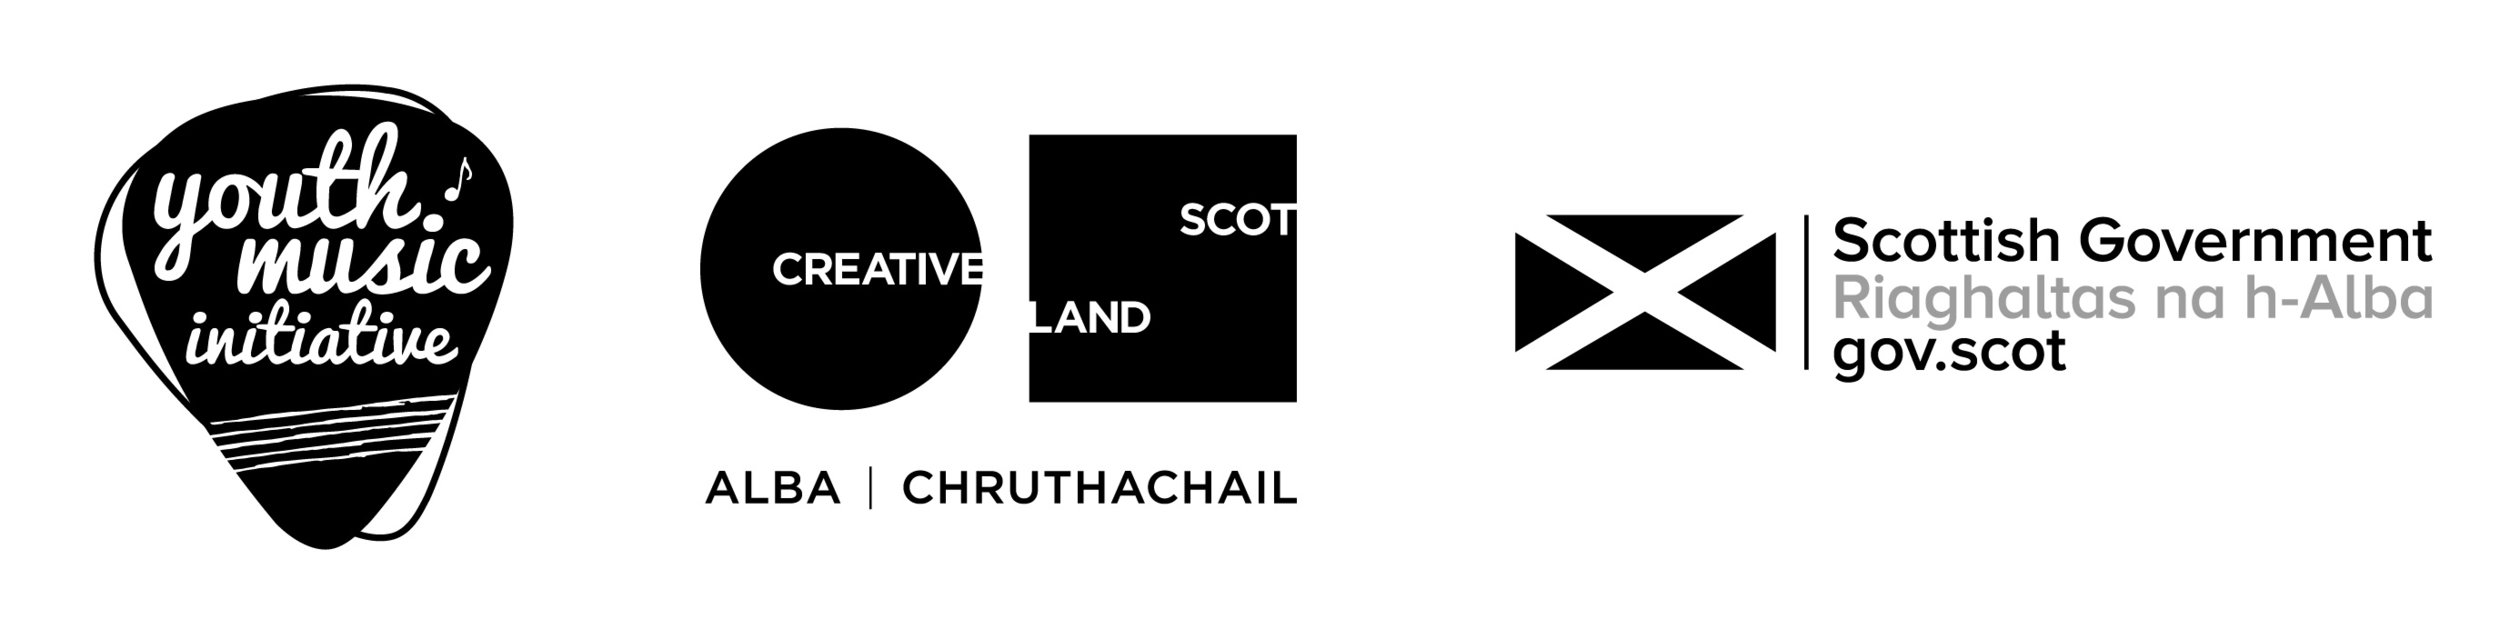 ymi-cs-scot-gov-logos-black.jpg